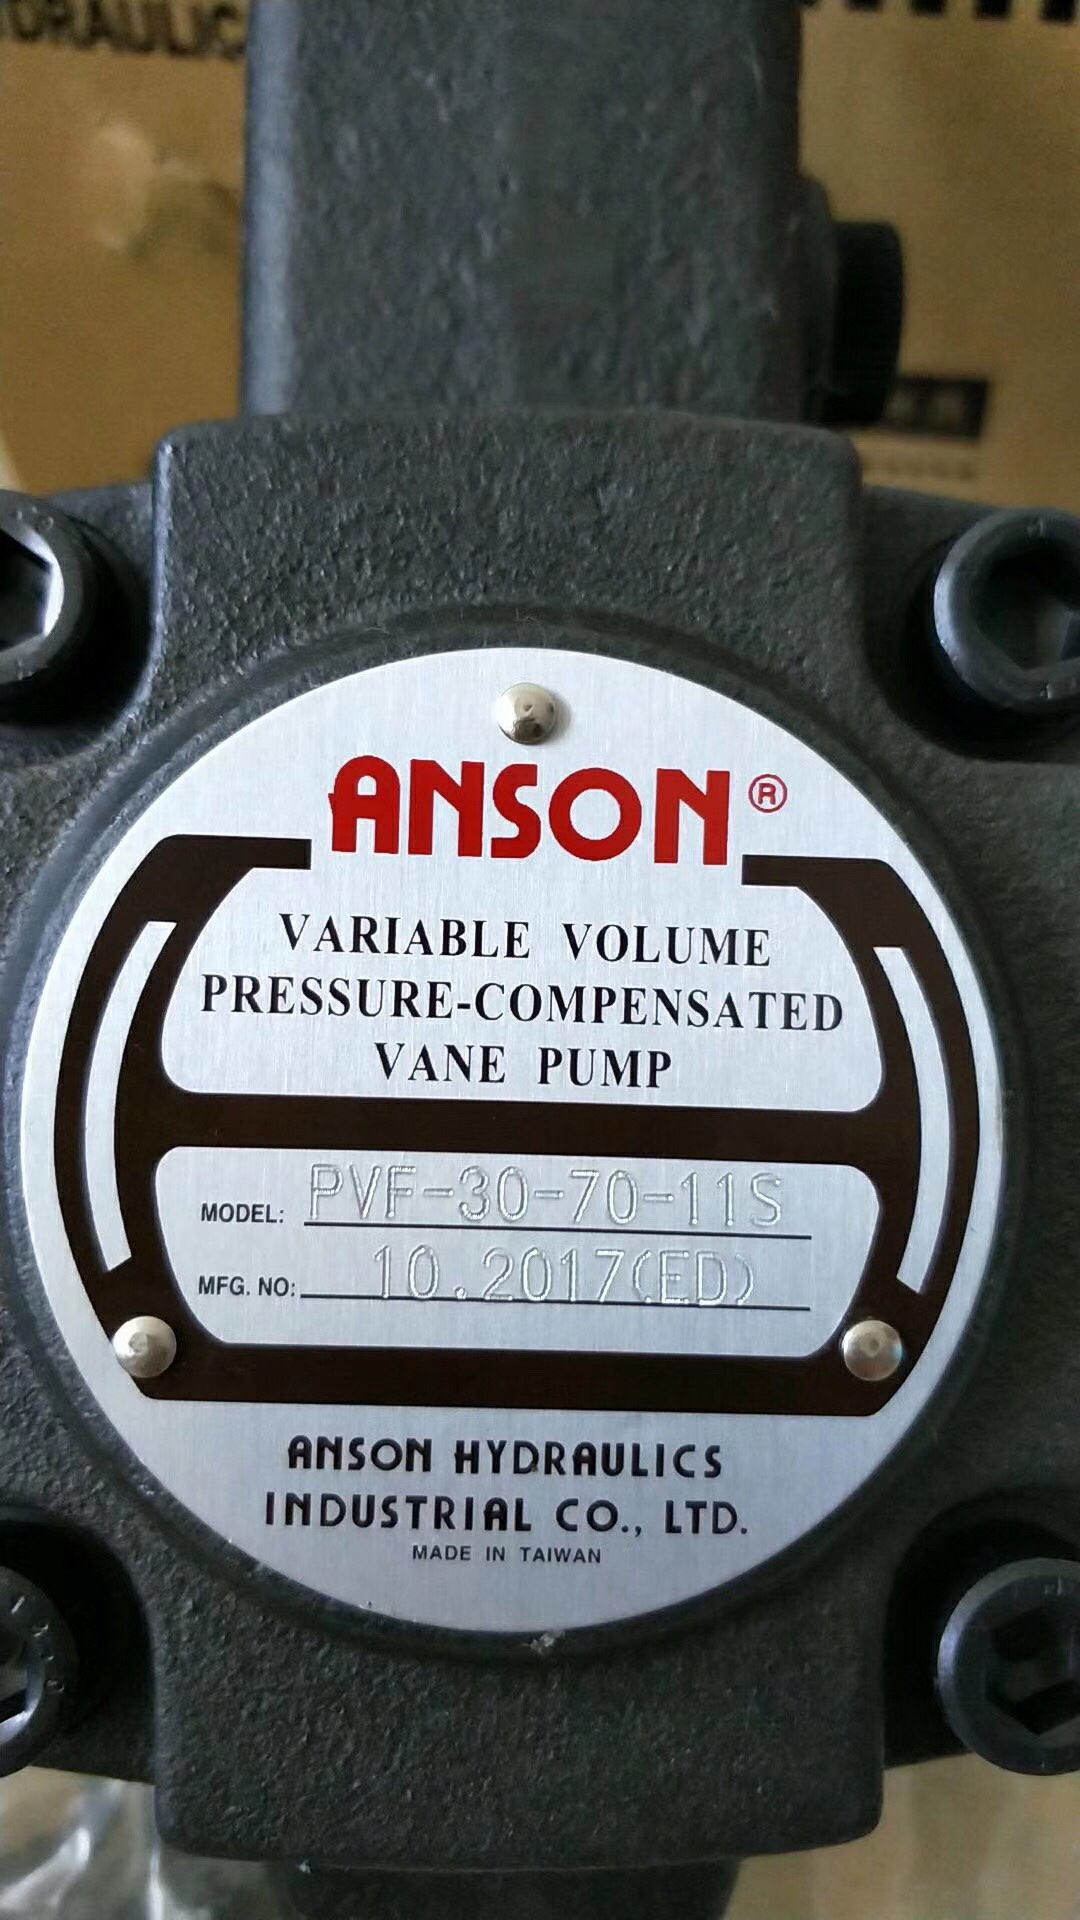 Bơm thủy lực ANSON PVF-30-70-11S